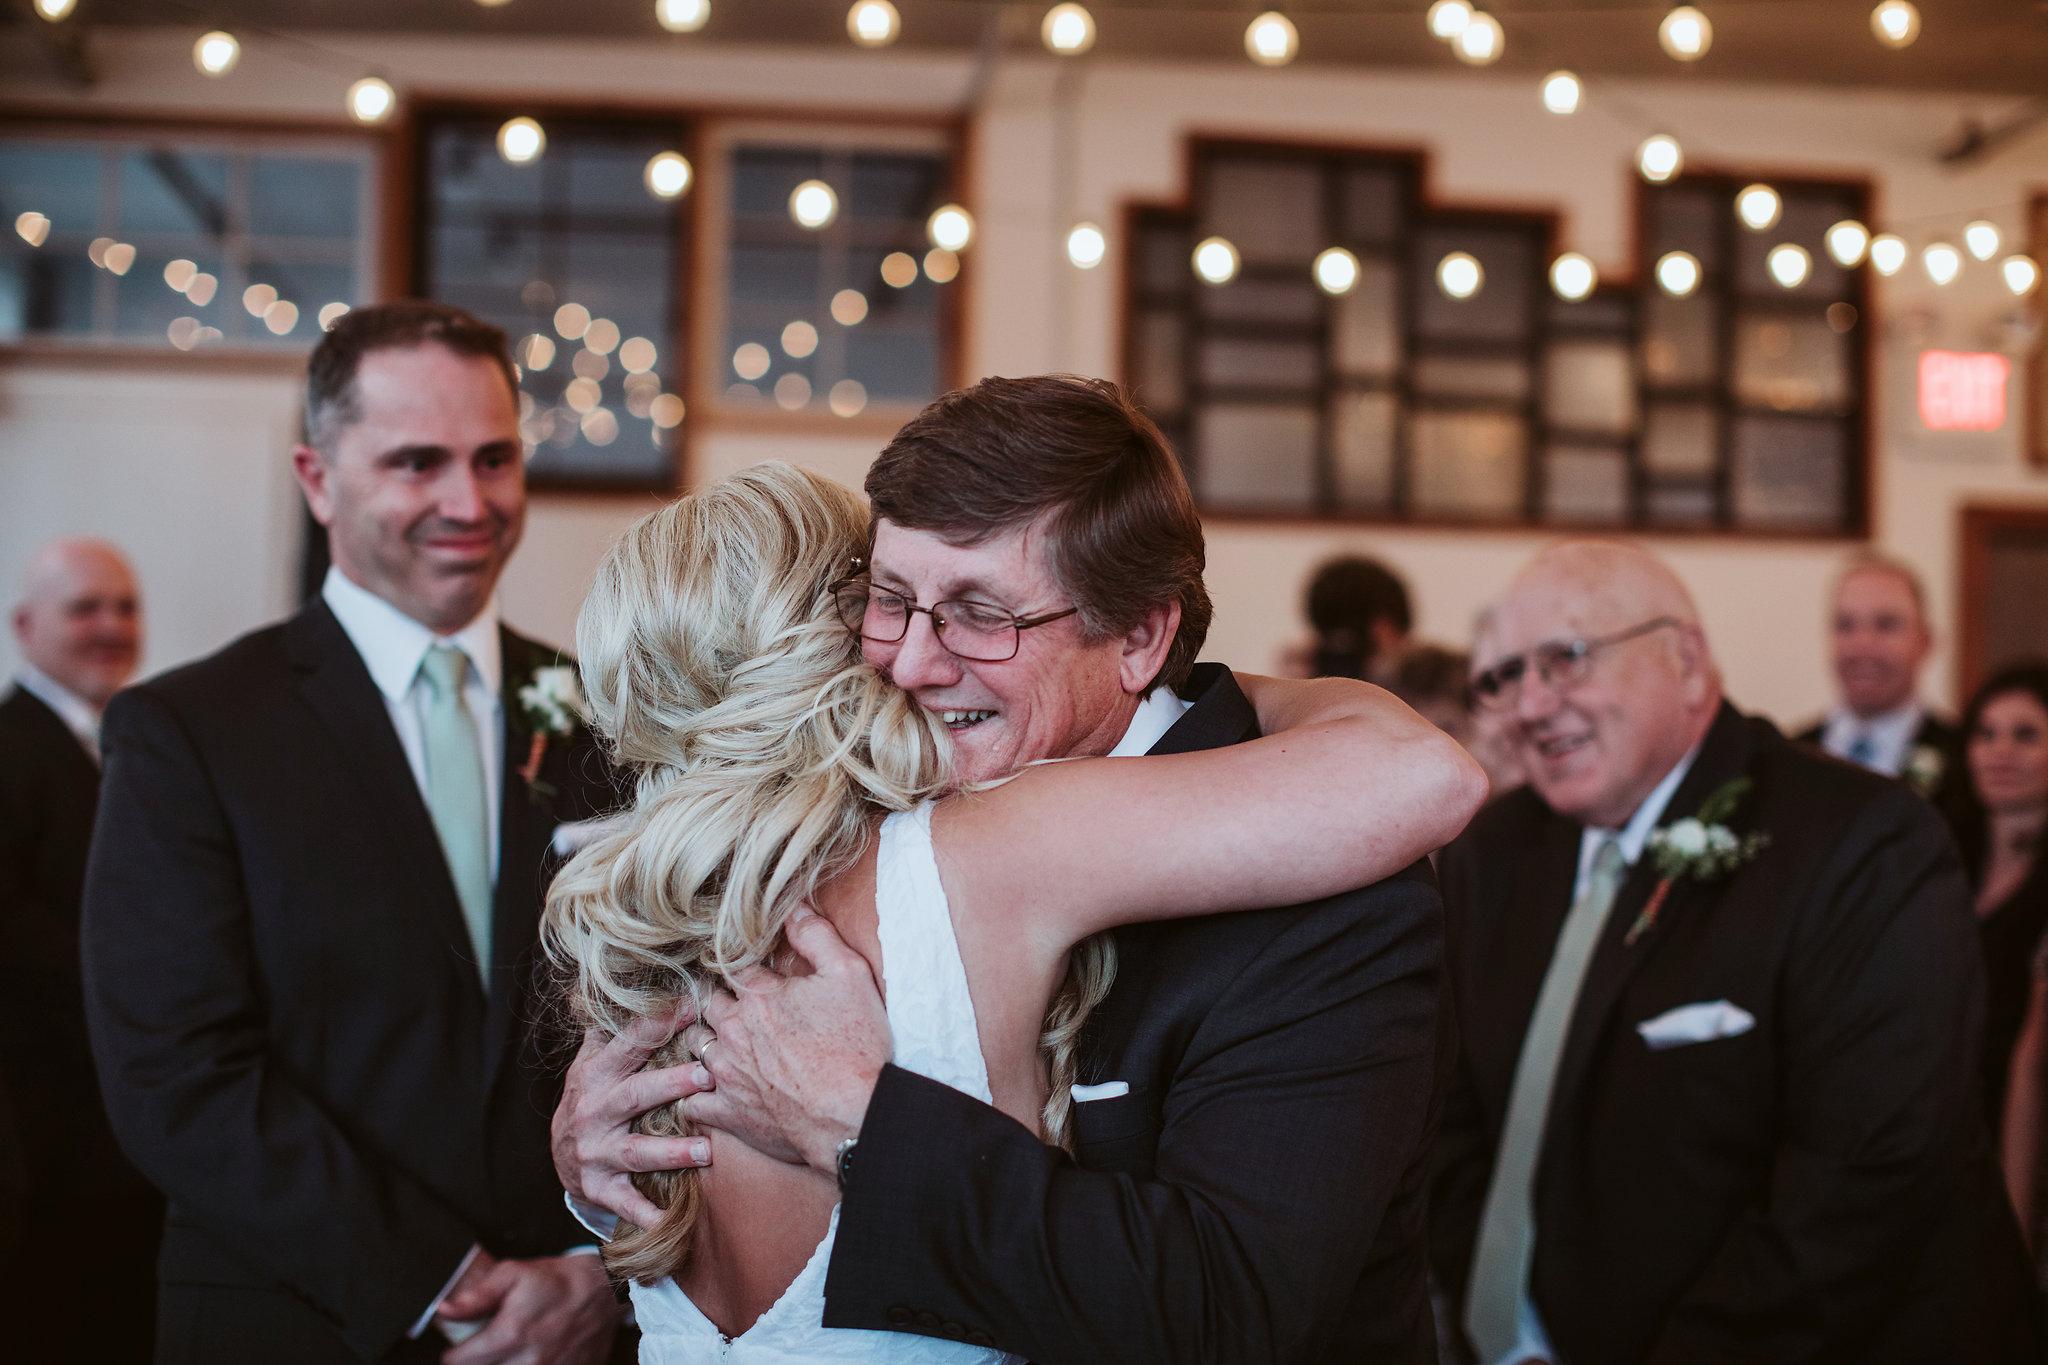 The Bride and The Bauer Wedding_Cinder Block Brewery Wedding_Kindling Wedding Photography_12.JPG